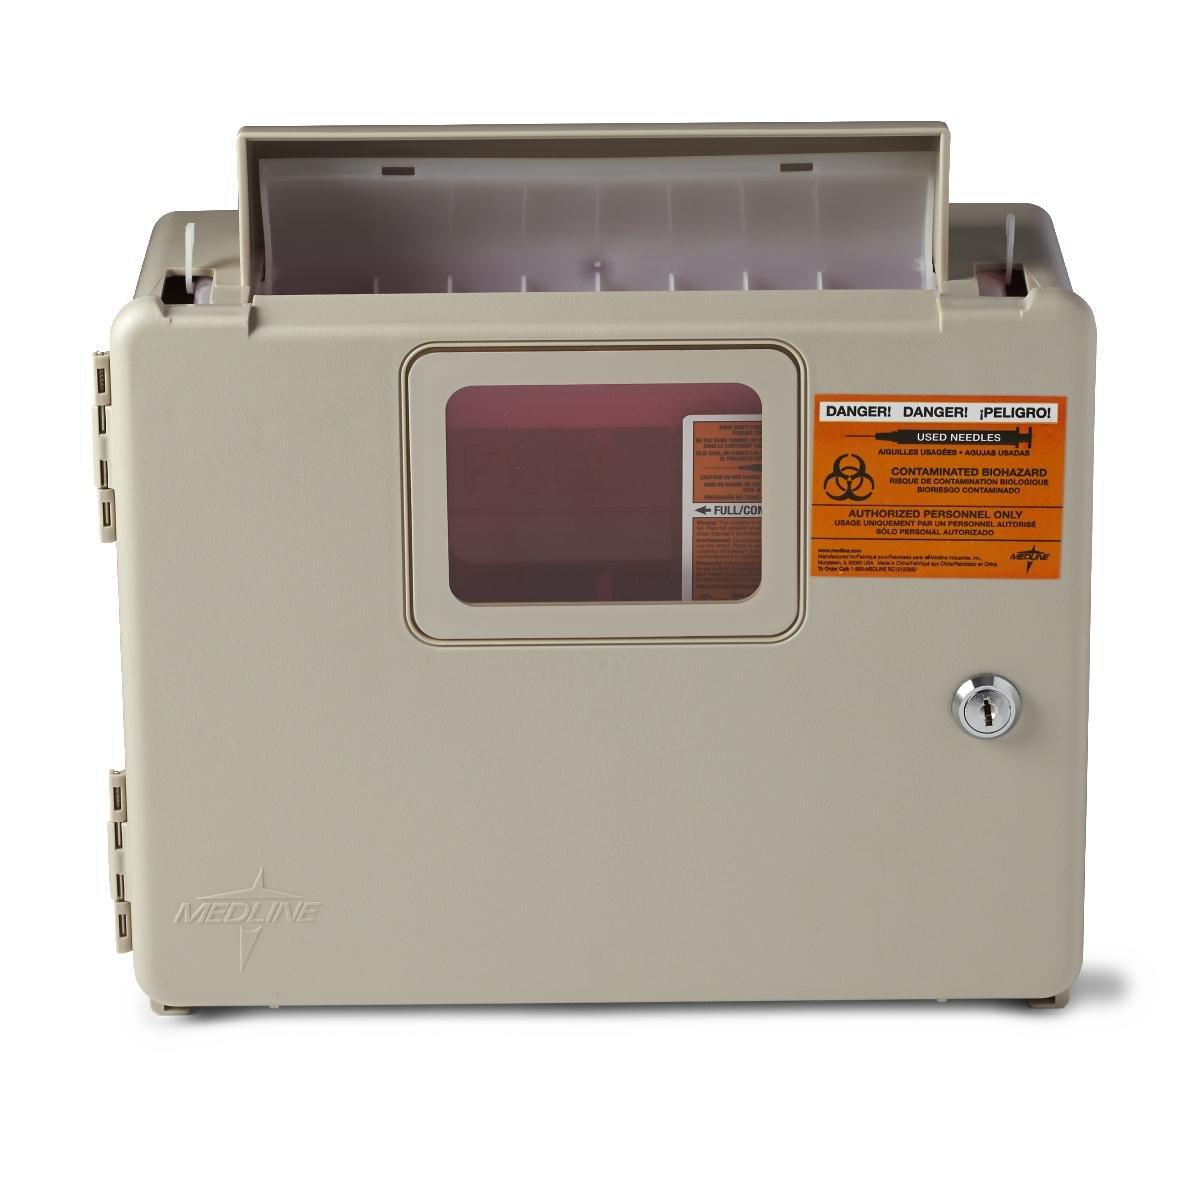 Medline MDS707953 Locking Sharps Container Cabinet